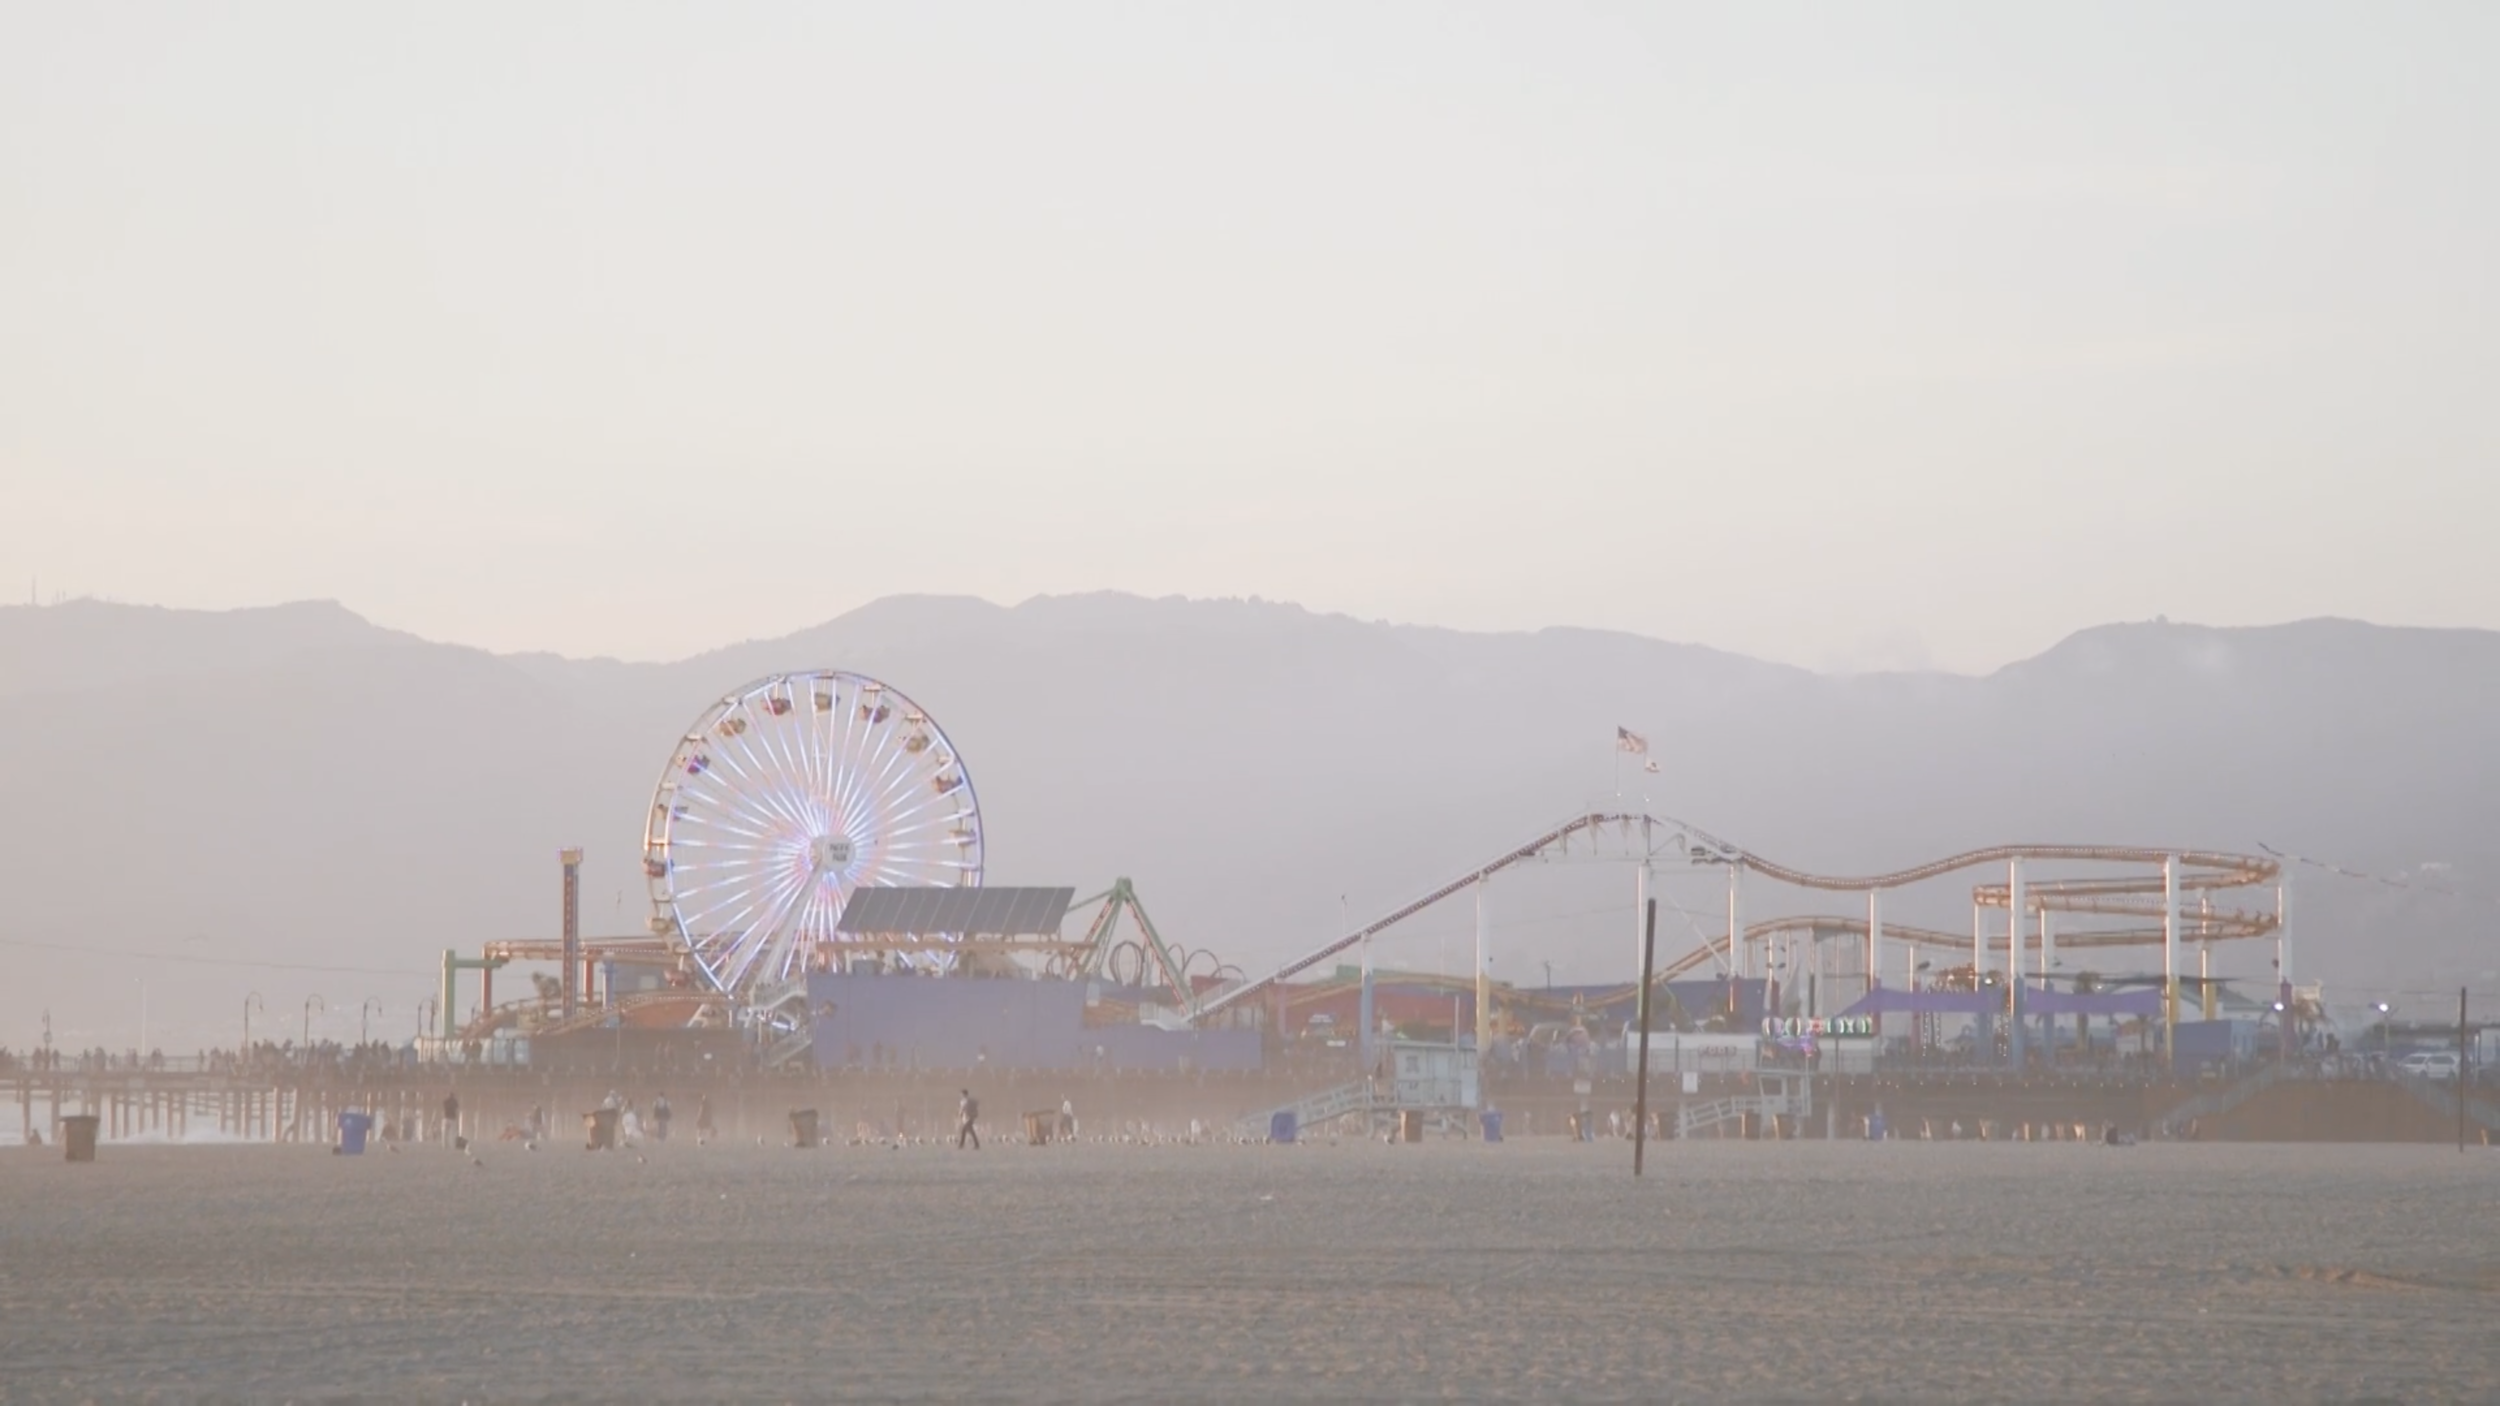 ferris-wheel-sunset-los-angeles.jpg